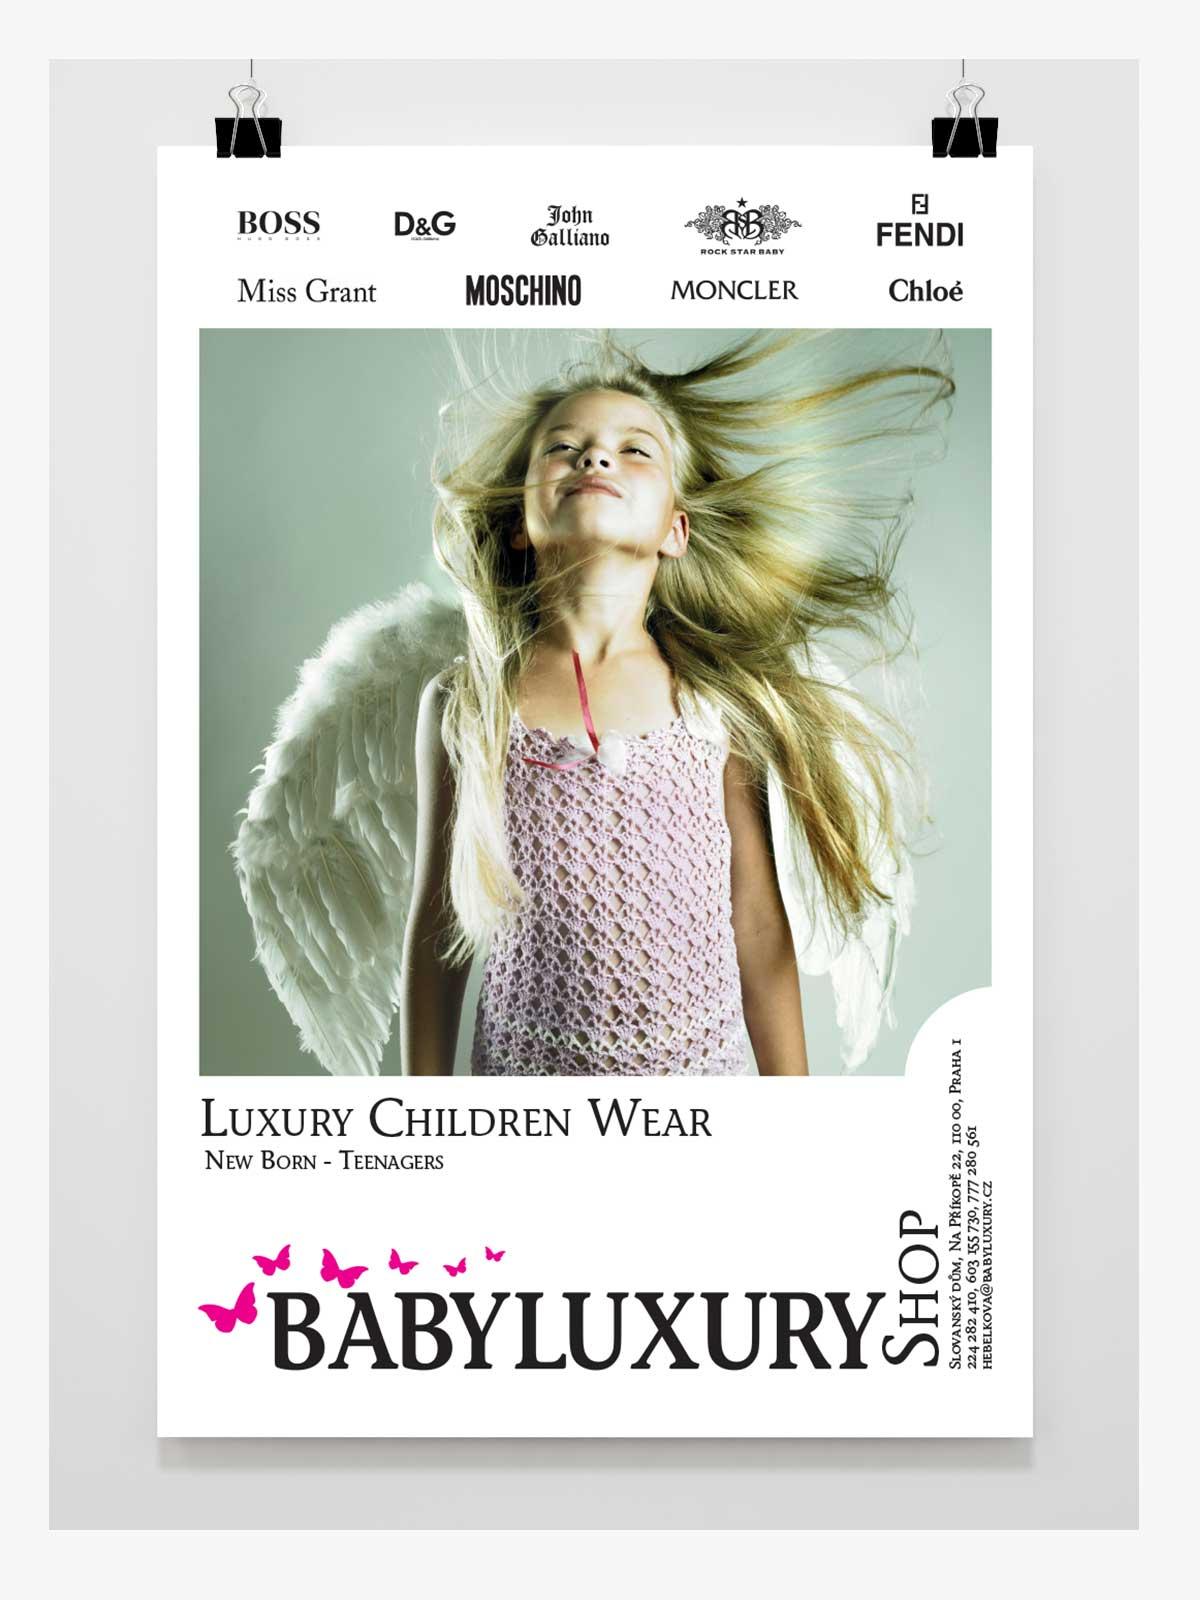 Vizuál Babyluxury